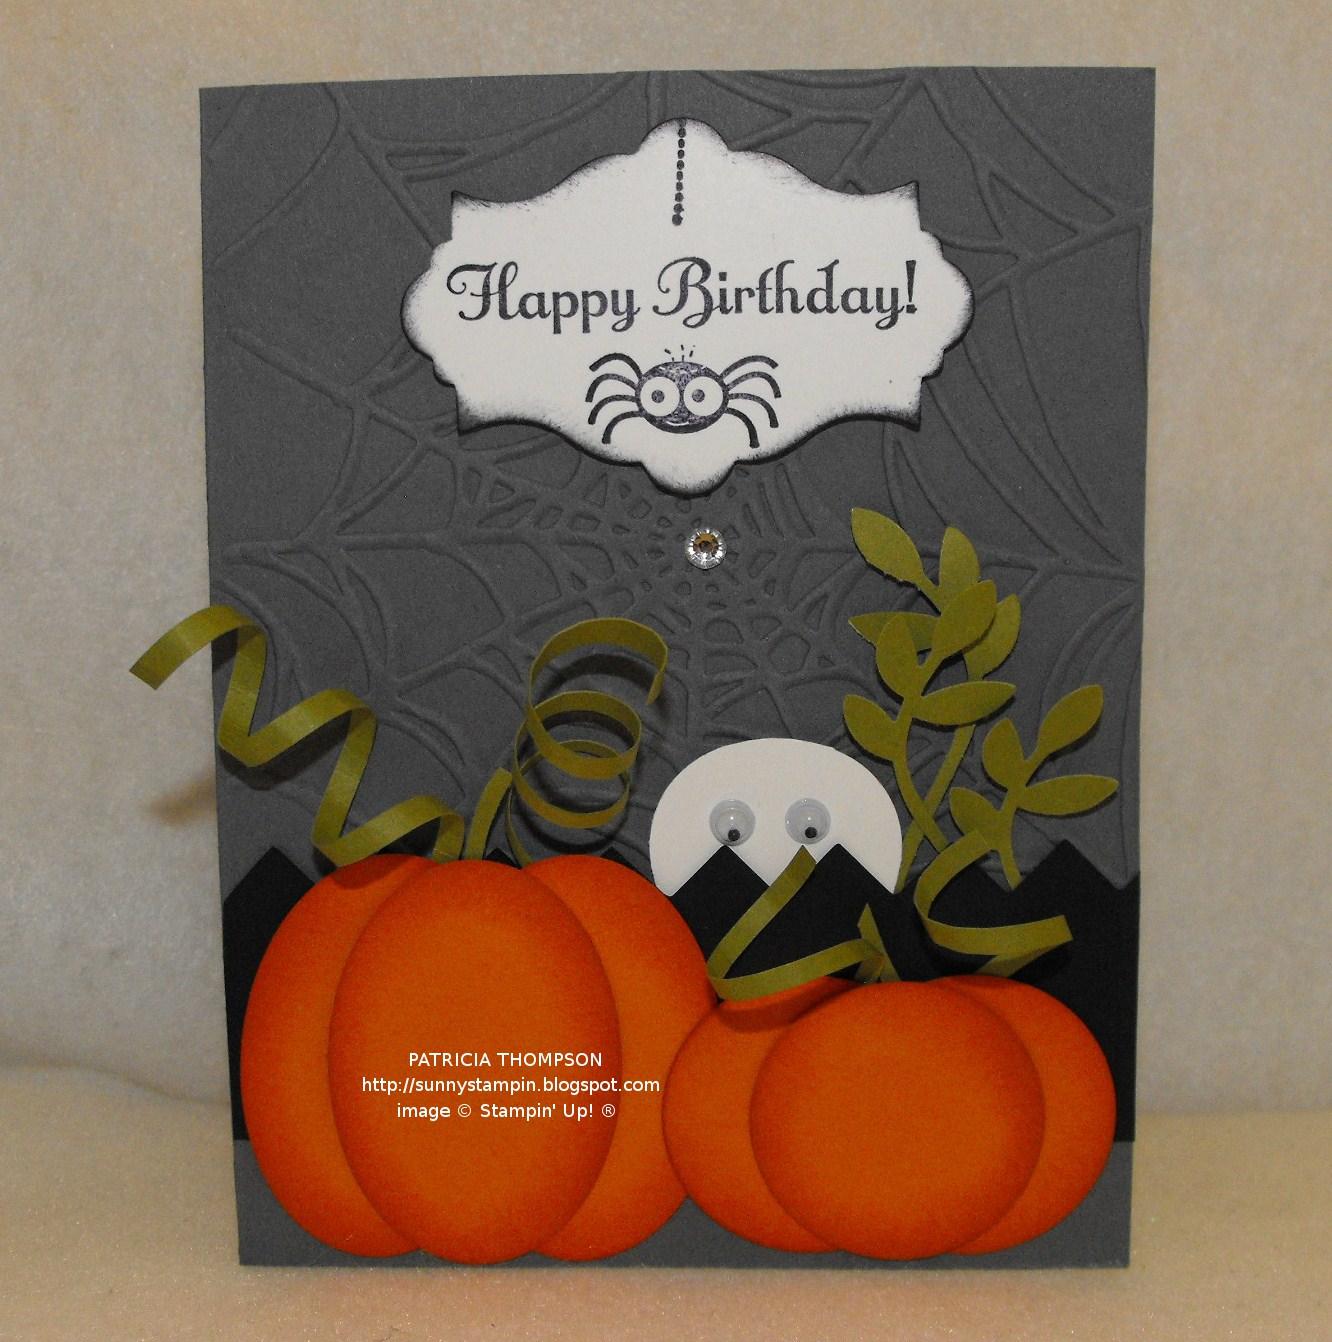 Sunnyone Stampin': Happy Halloween/Happy Birthday!